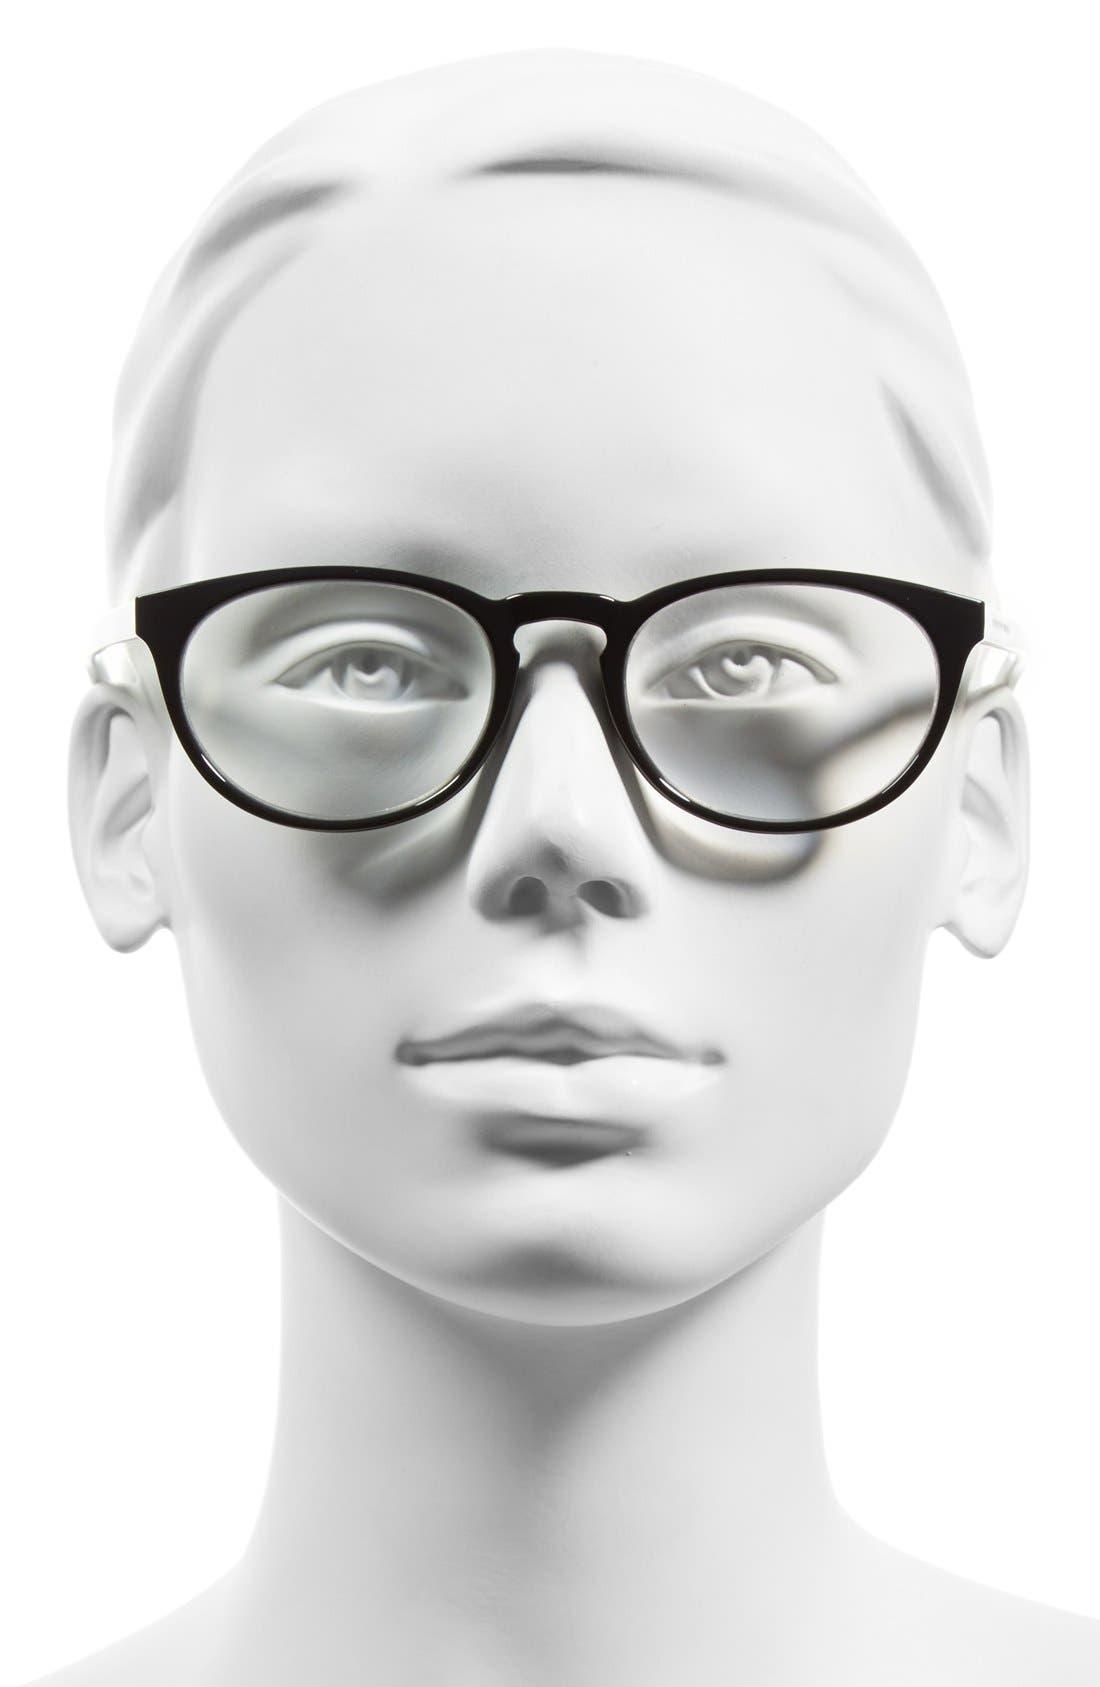 '803' 51mm Reading Glasses,                             Alternate thumbnail 2, color,                             001